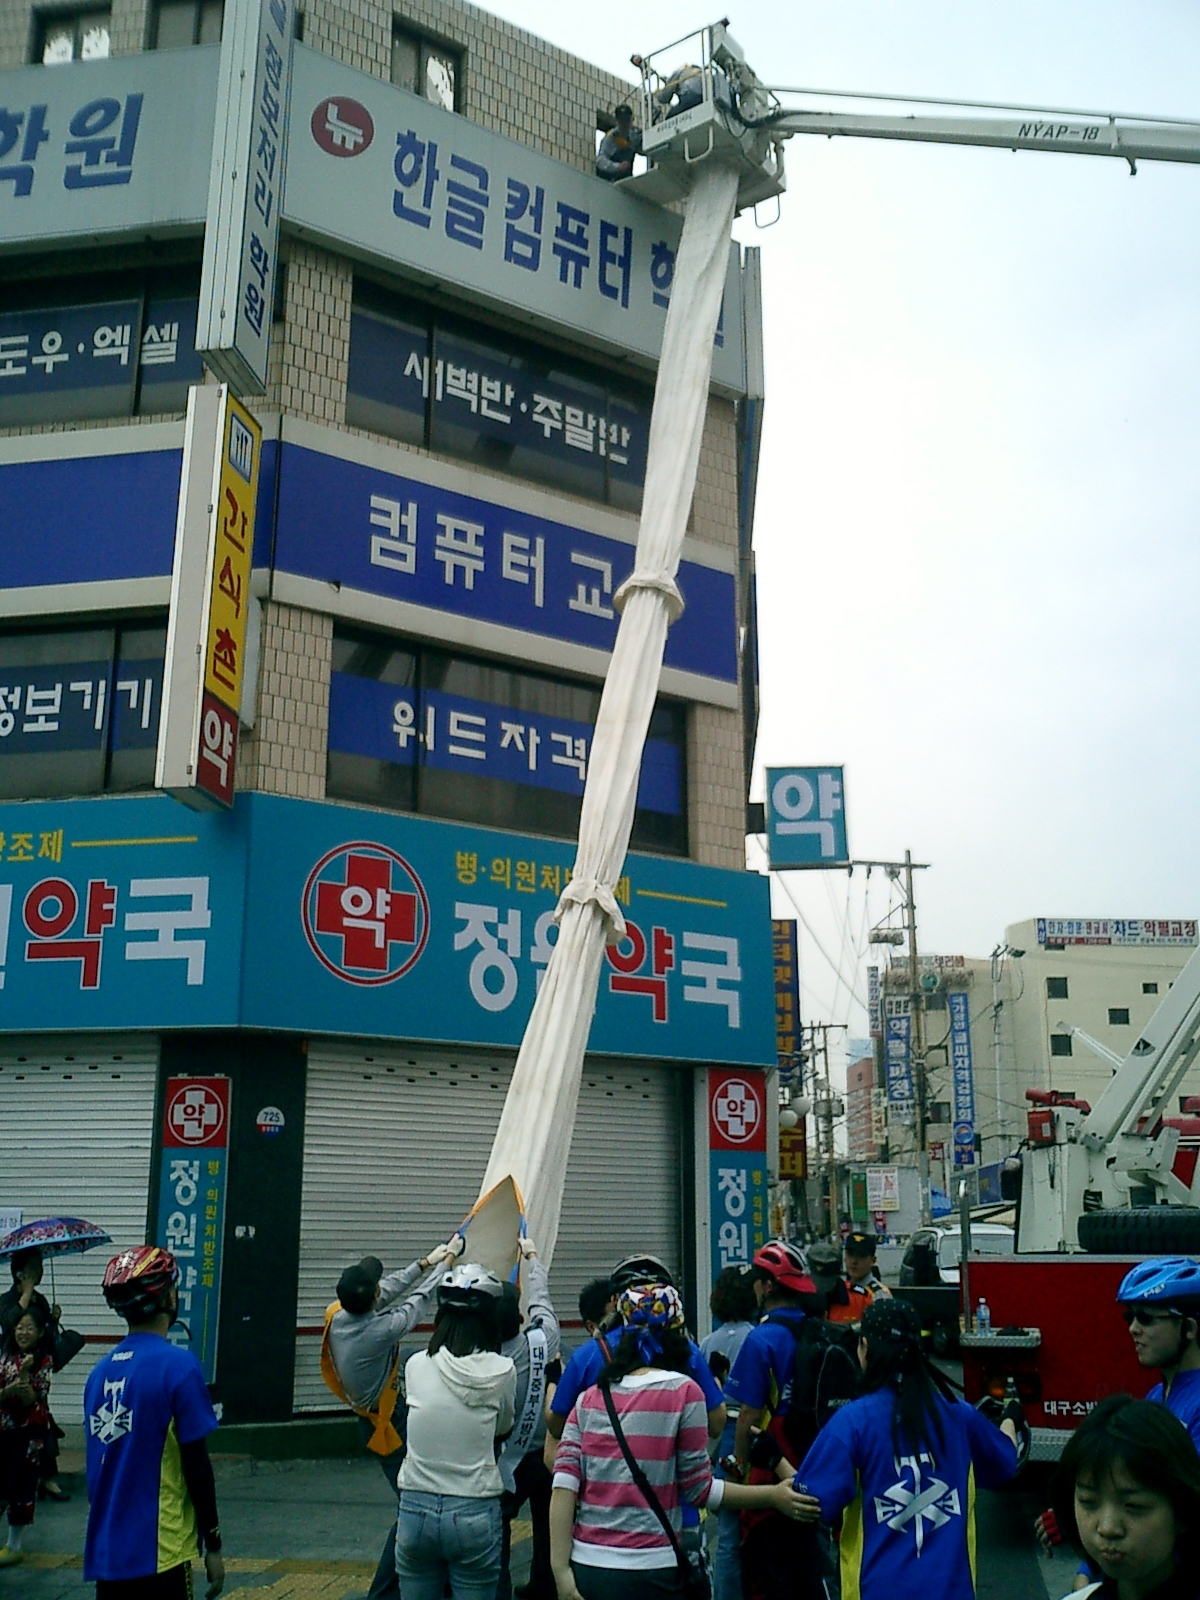 Fire Escape Chute For A Building